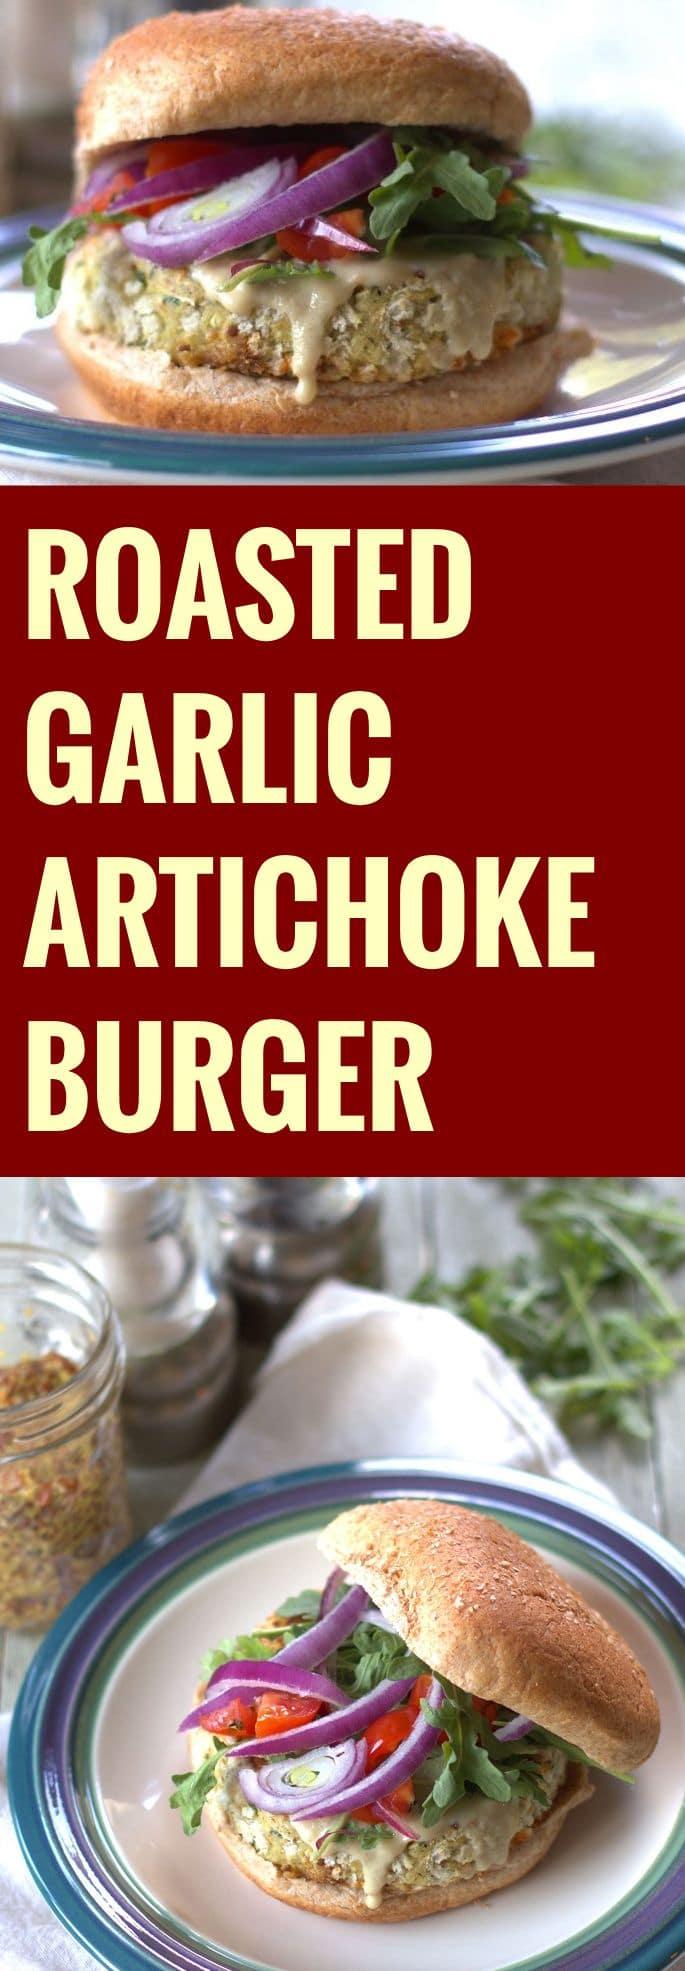 Roasted Garlic Artichoke Burgers